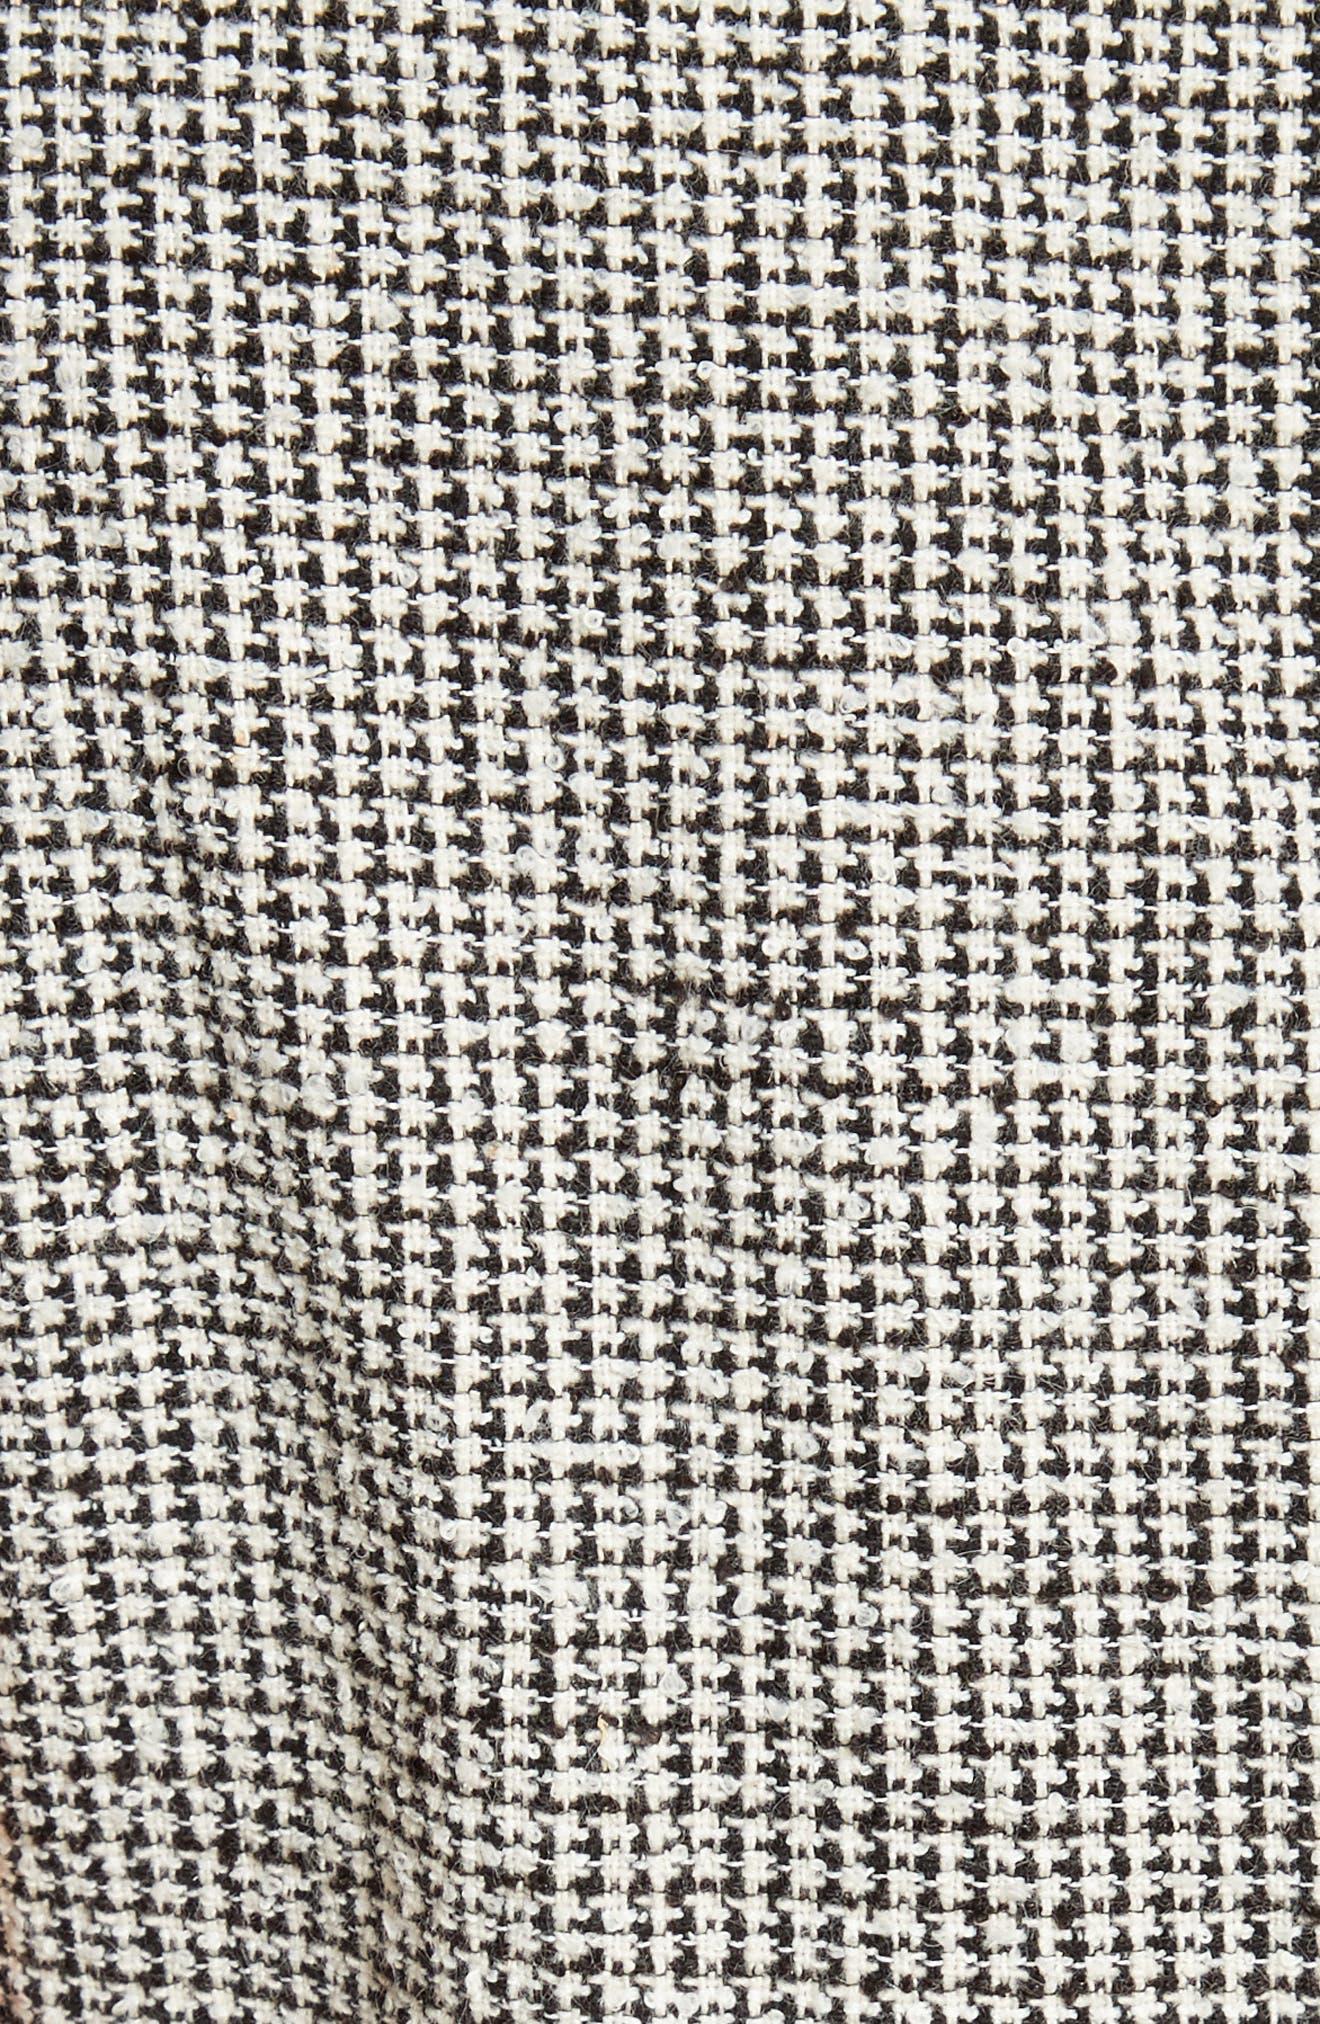 Coley Mock Neck Dress,                             Alternate thumbnail 5, color,